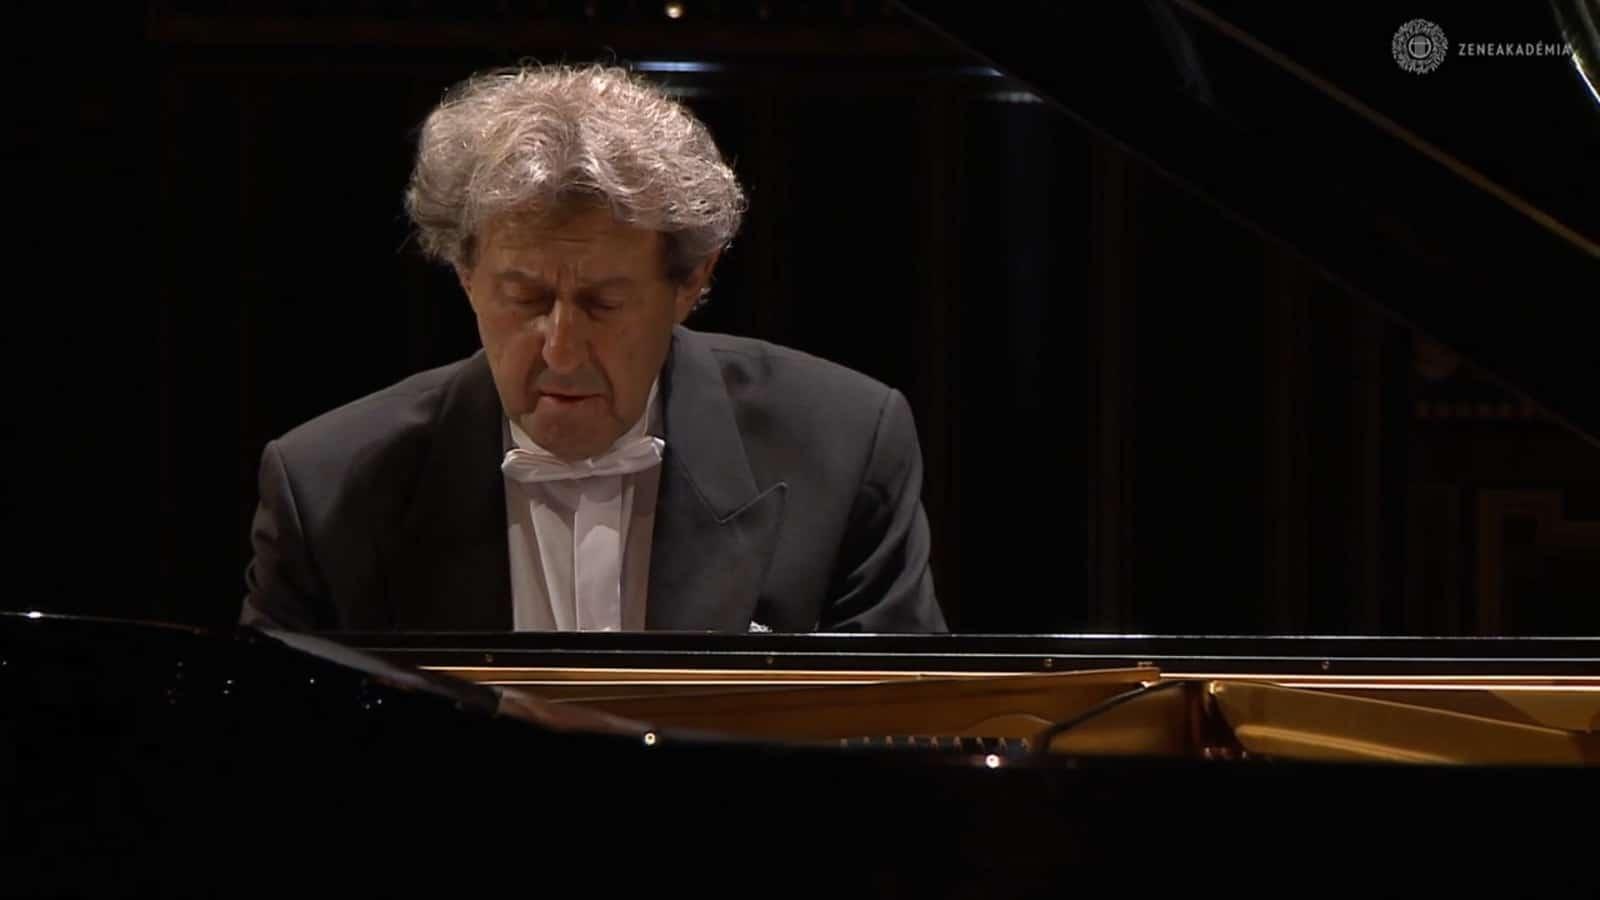 drafi kalman zongoraest